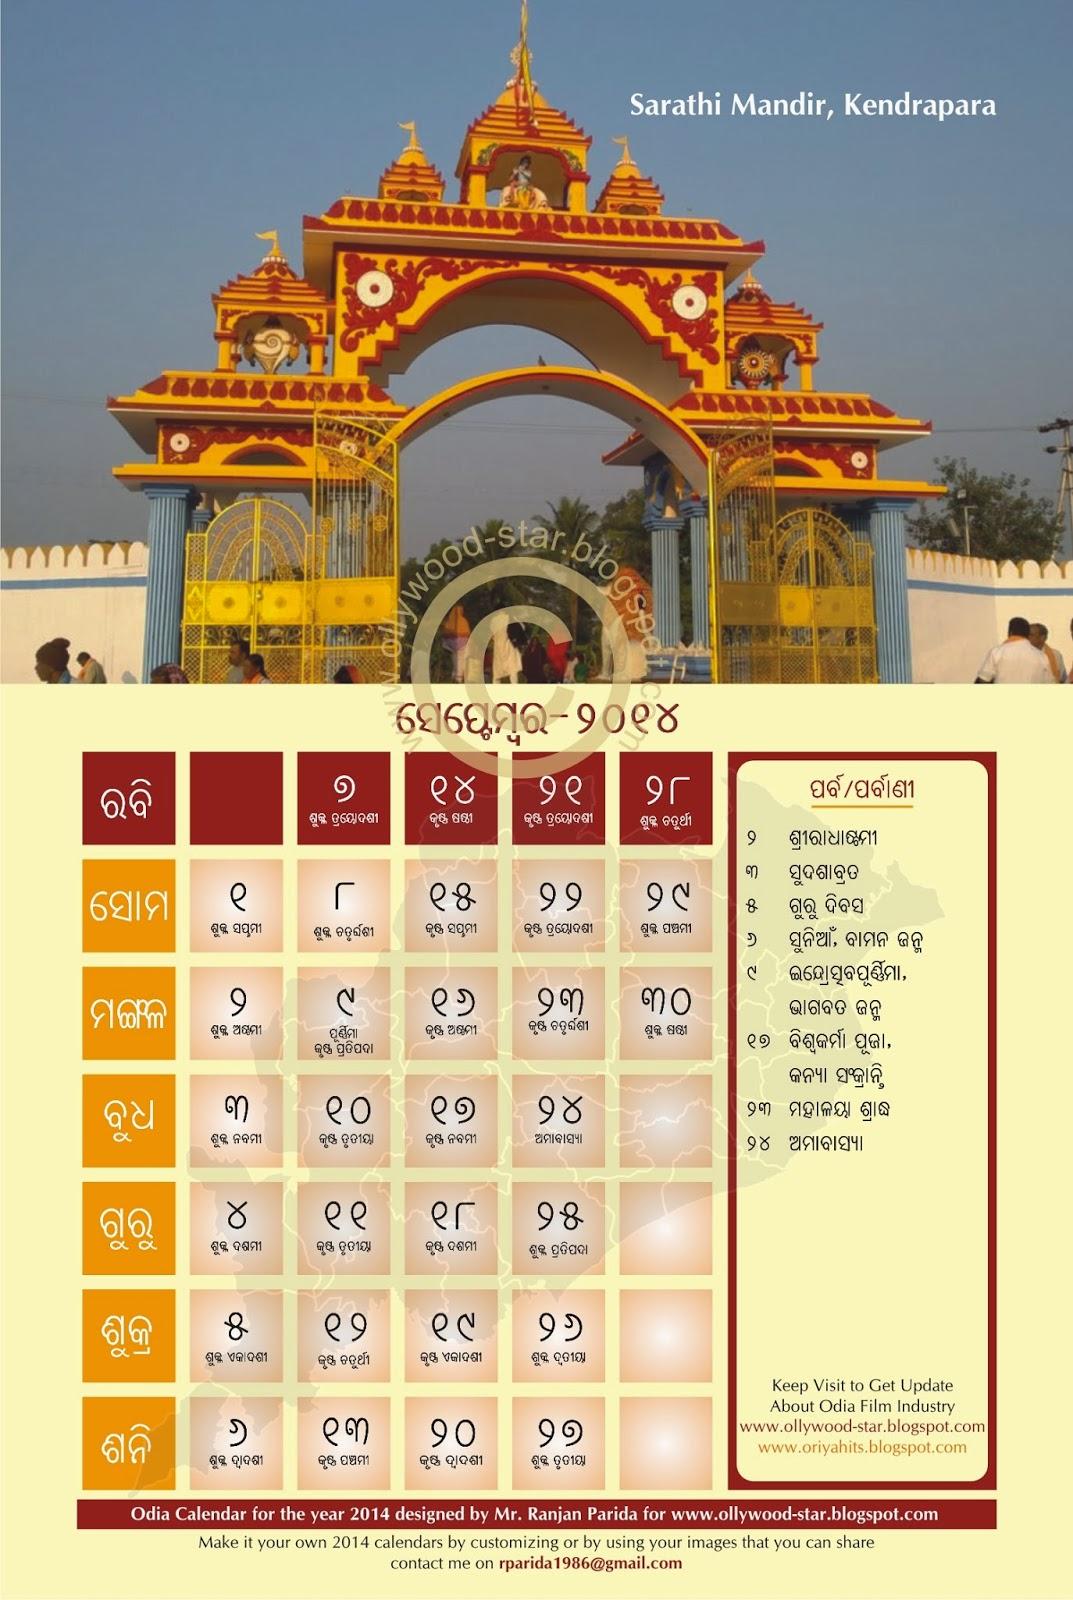 September 2014 Issue: High Quality Colorful Oriya (Odia) 2014 Calendar